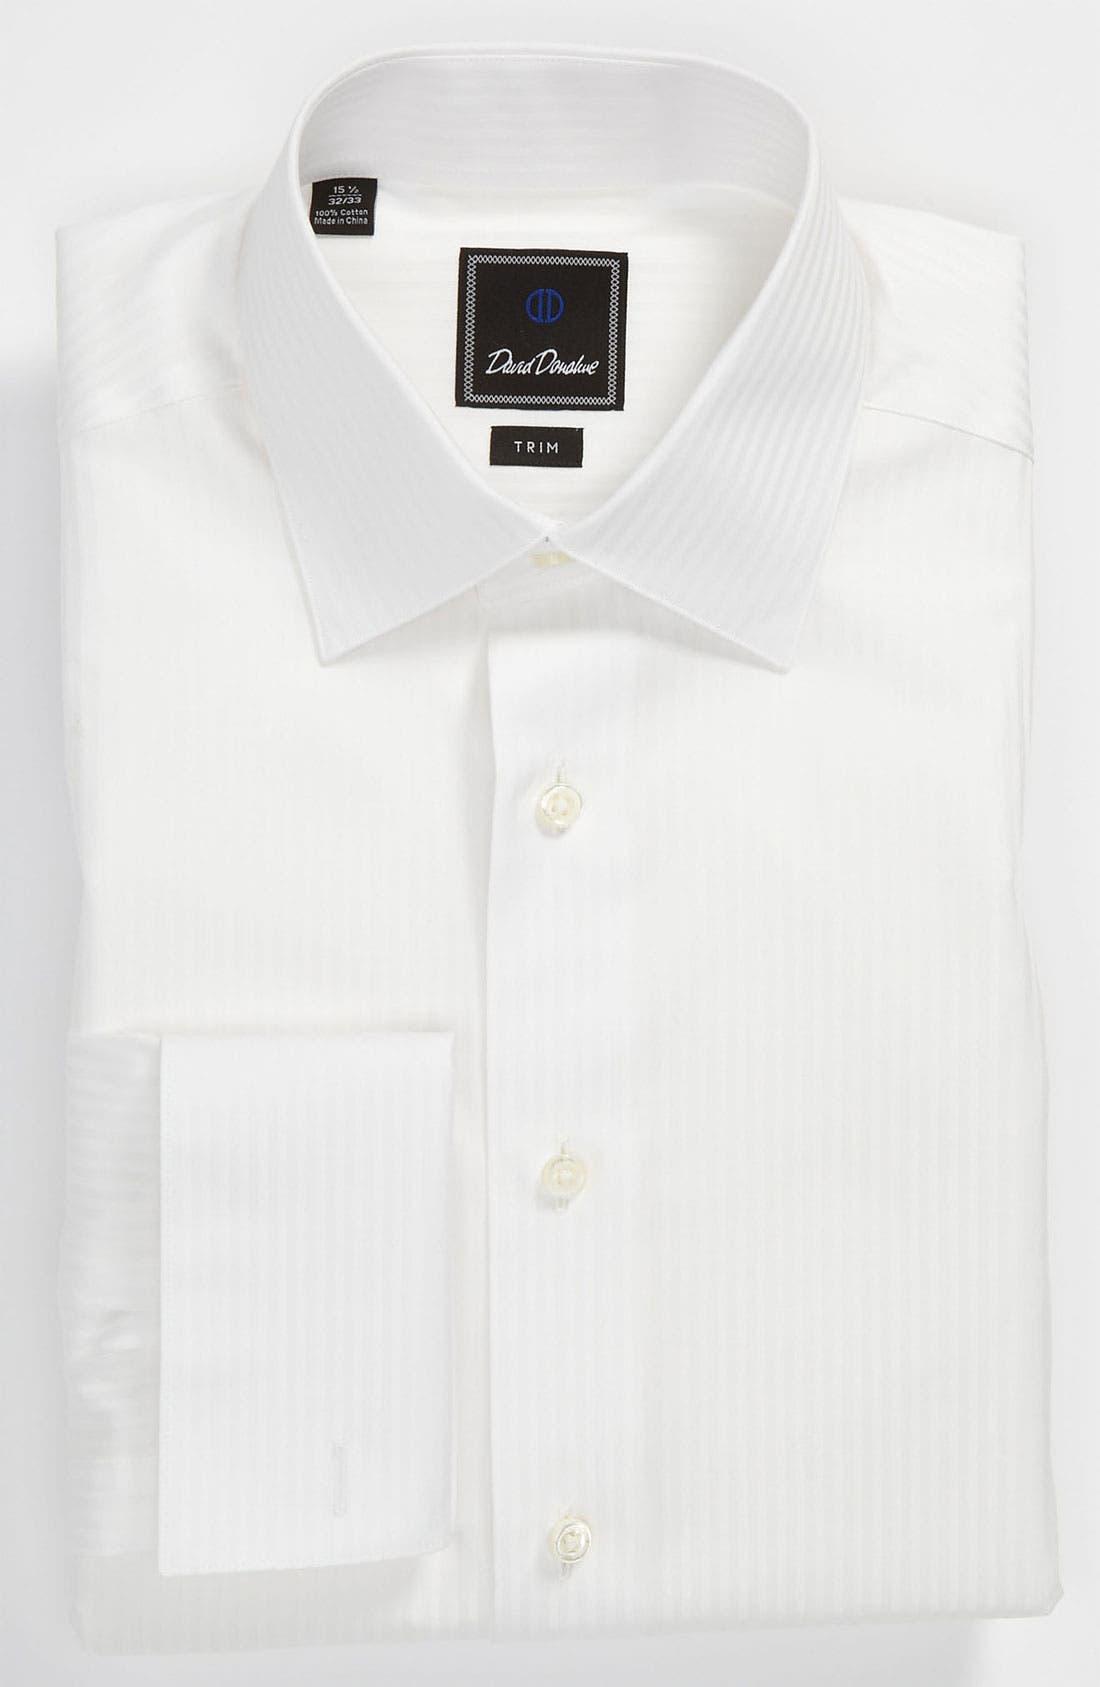 Main Image - David Donahue Trim Fit Tuxedo Shirt